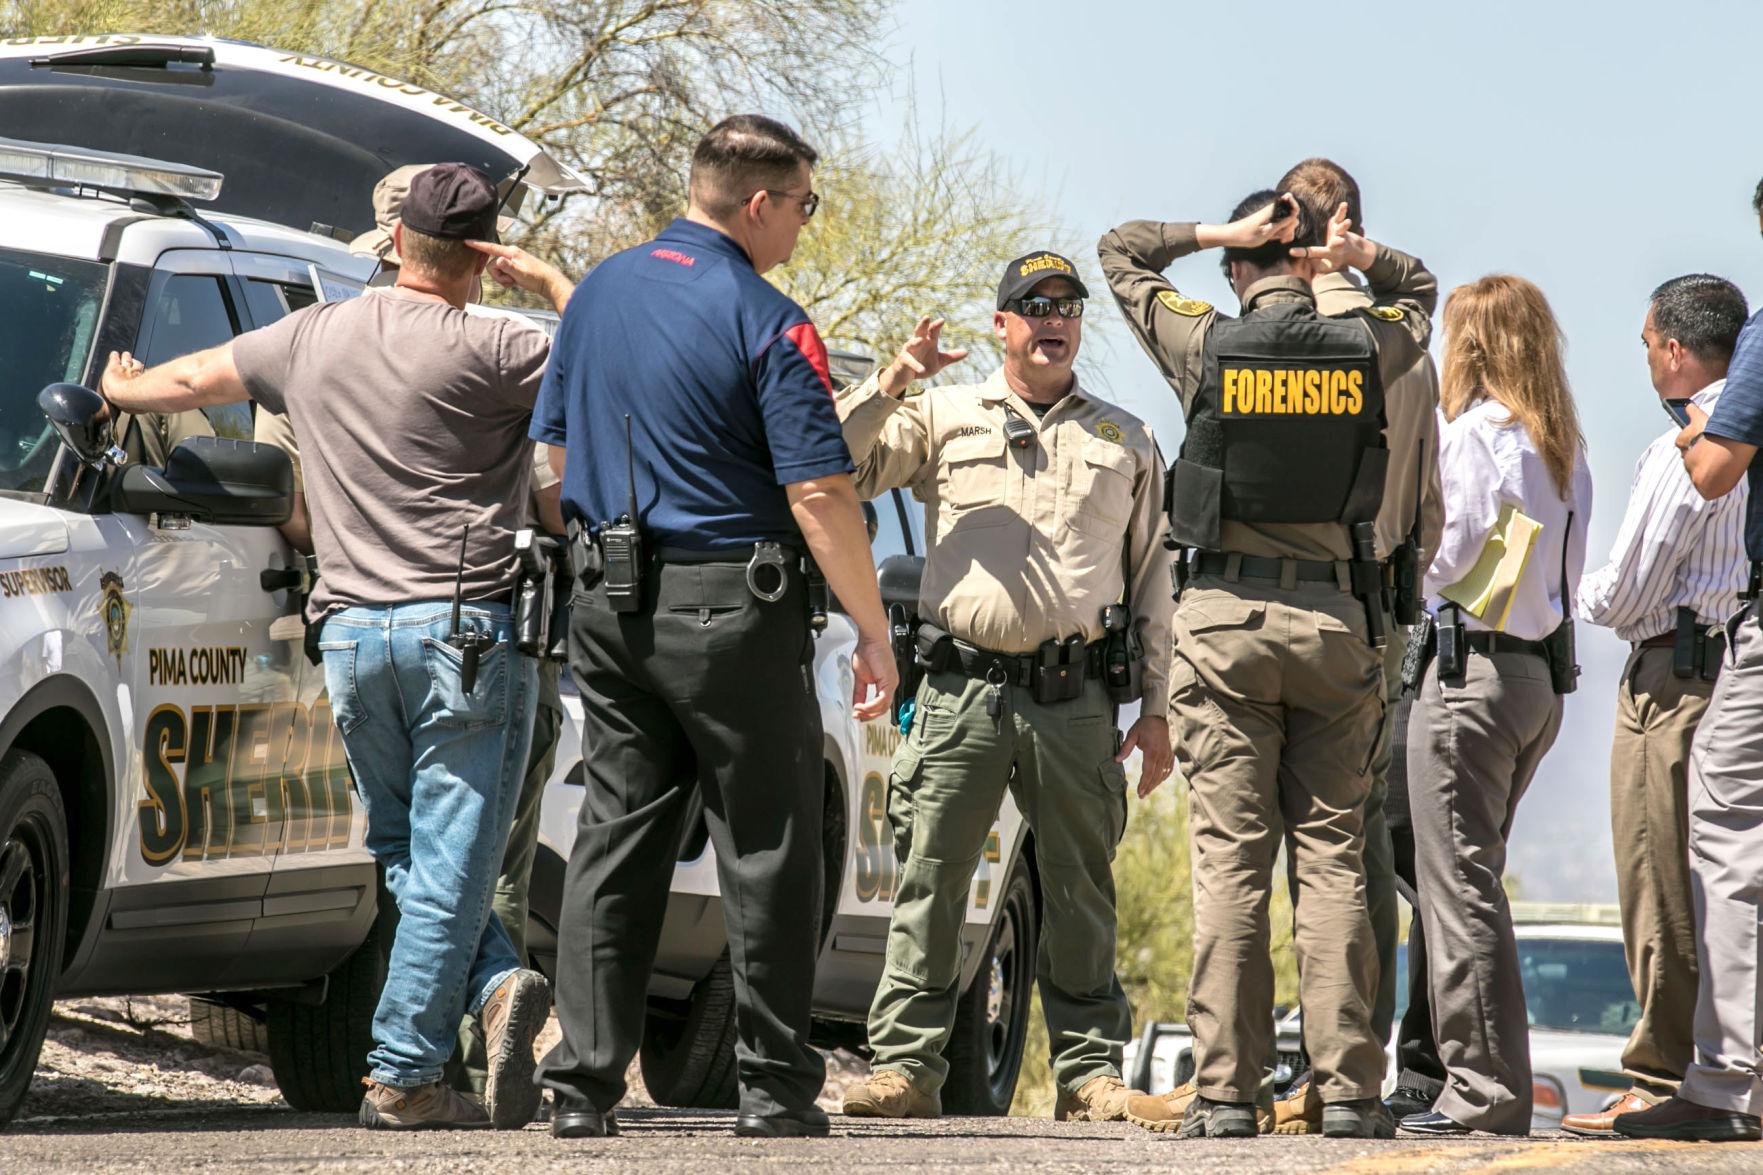 Tucson businessman identified as homicide victim, missing vehicle sought | Tucson.com